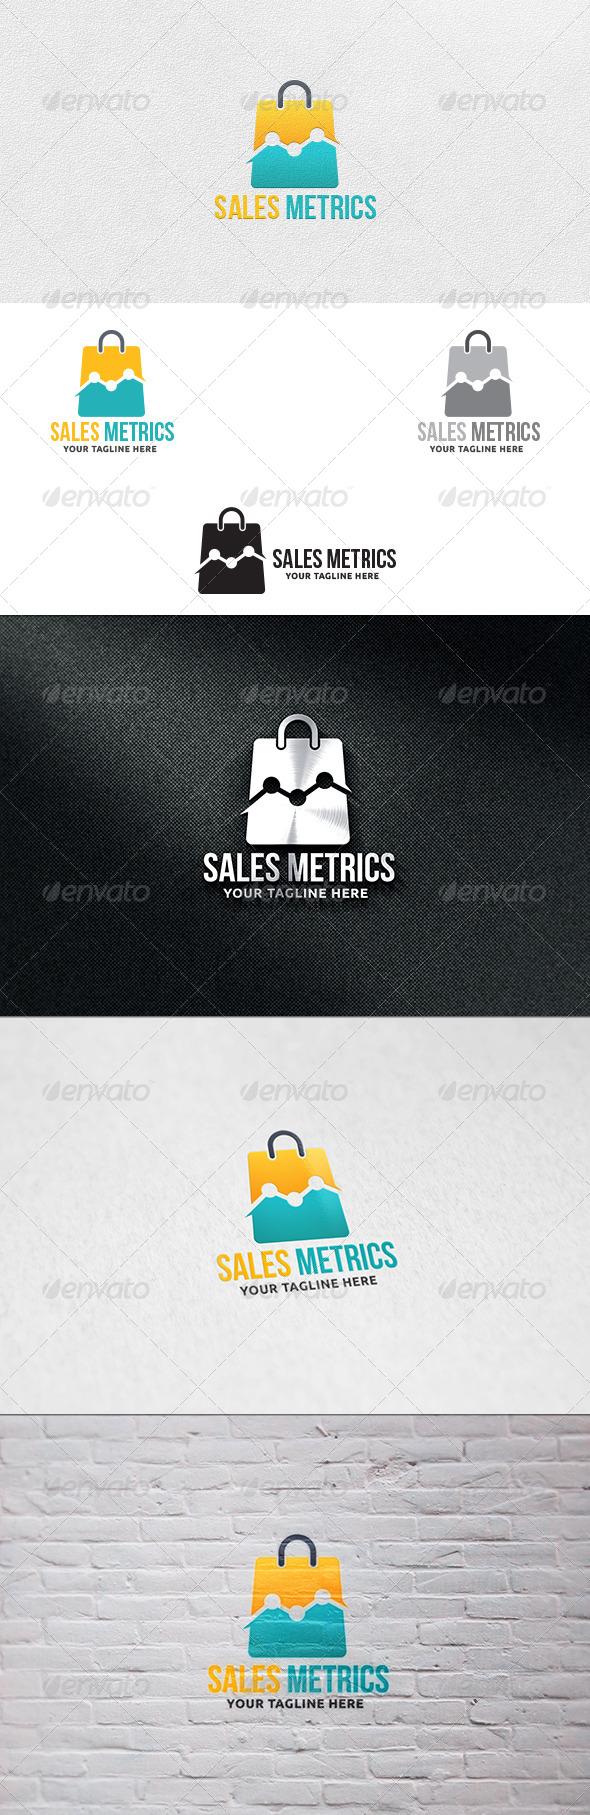 Sales Metrics V2 - Logo Template - Symbols Logo Templates